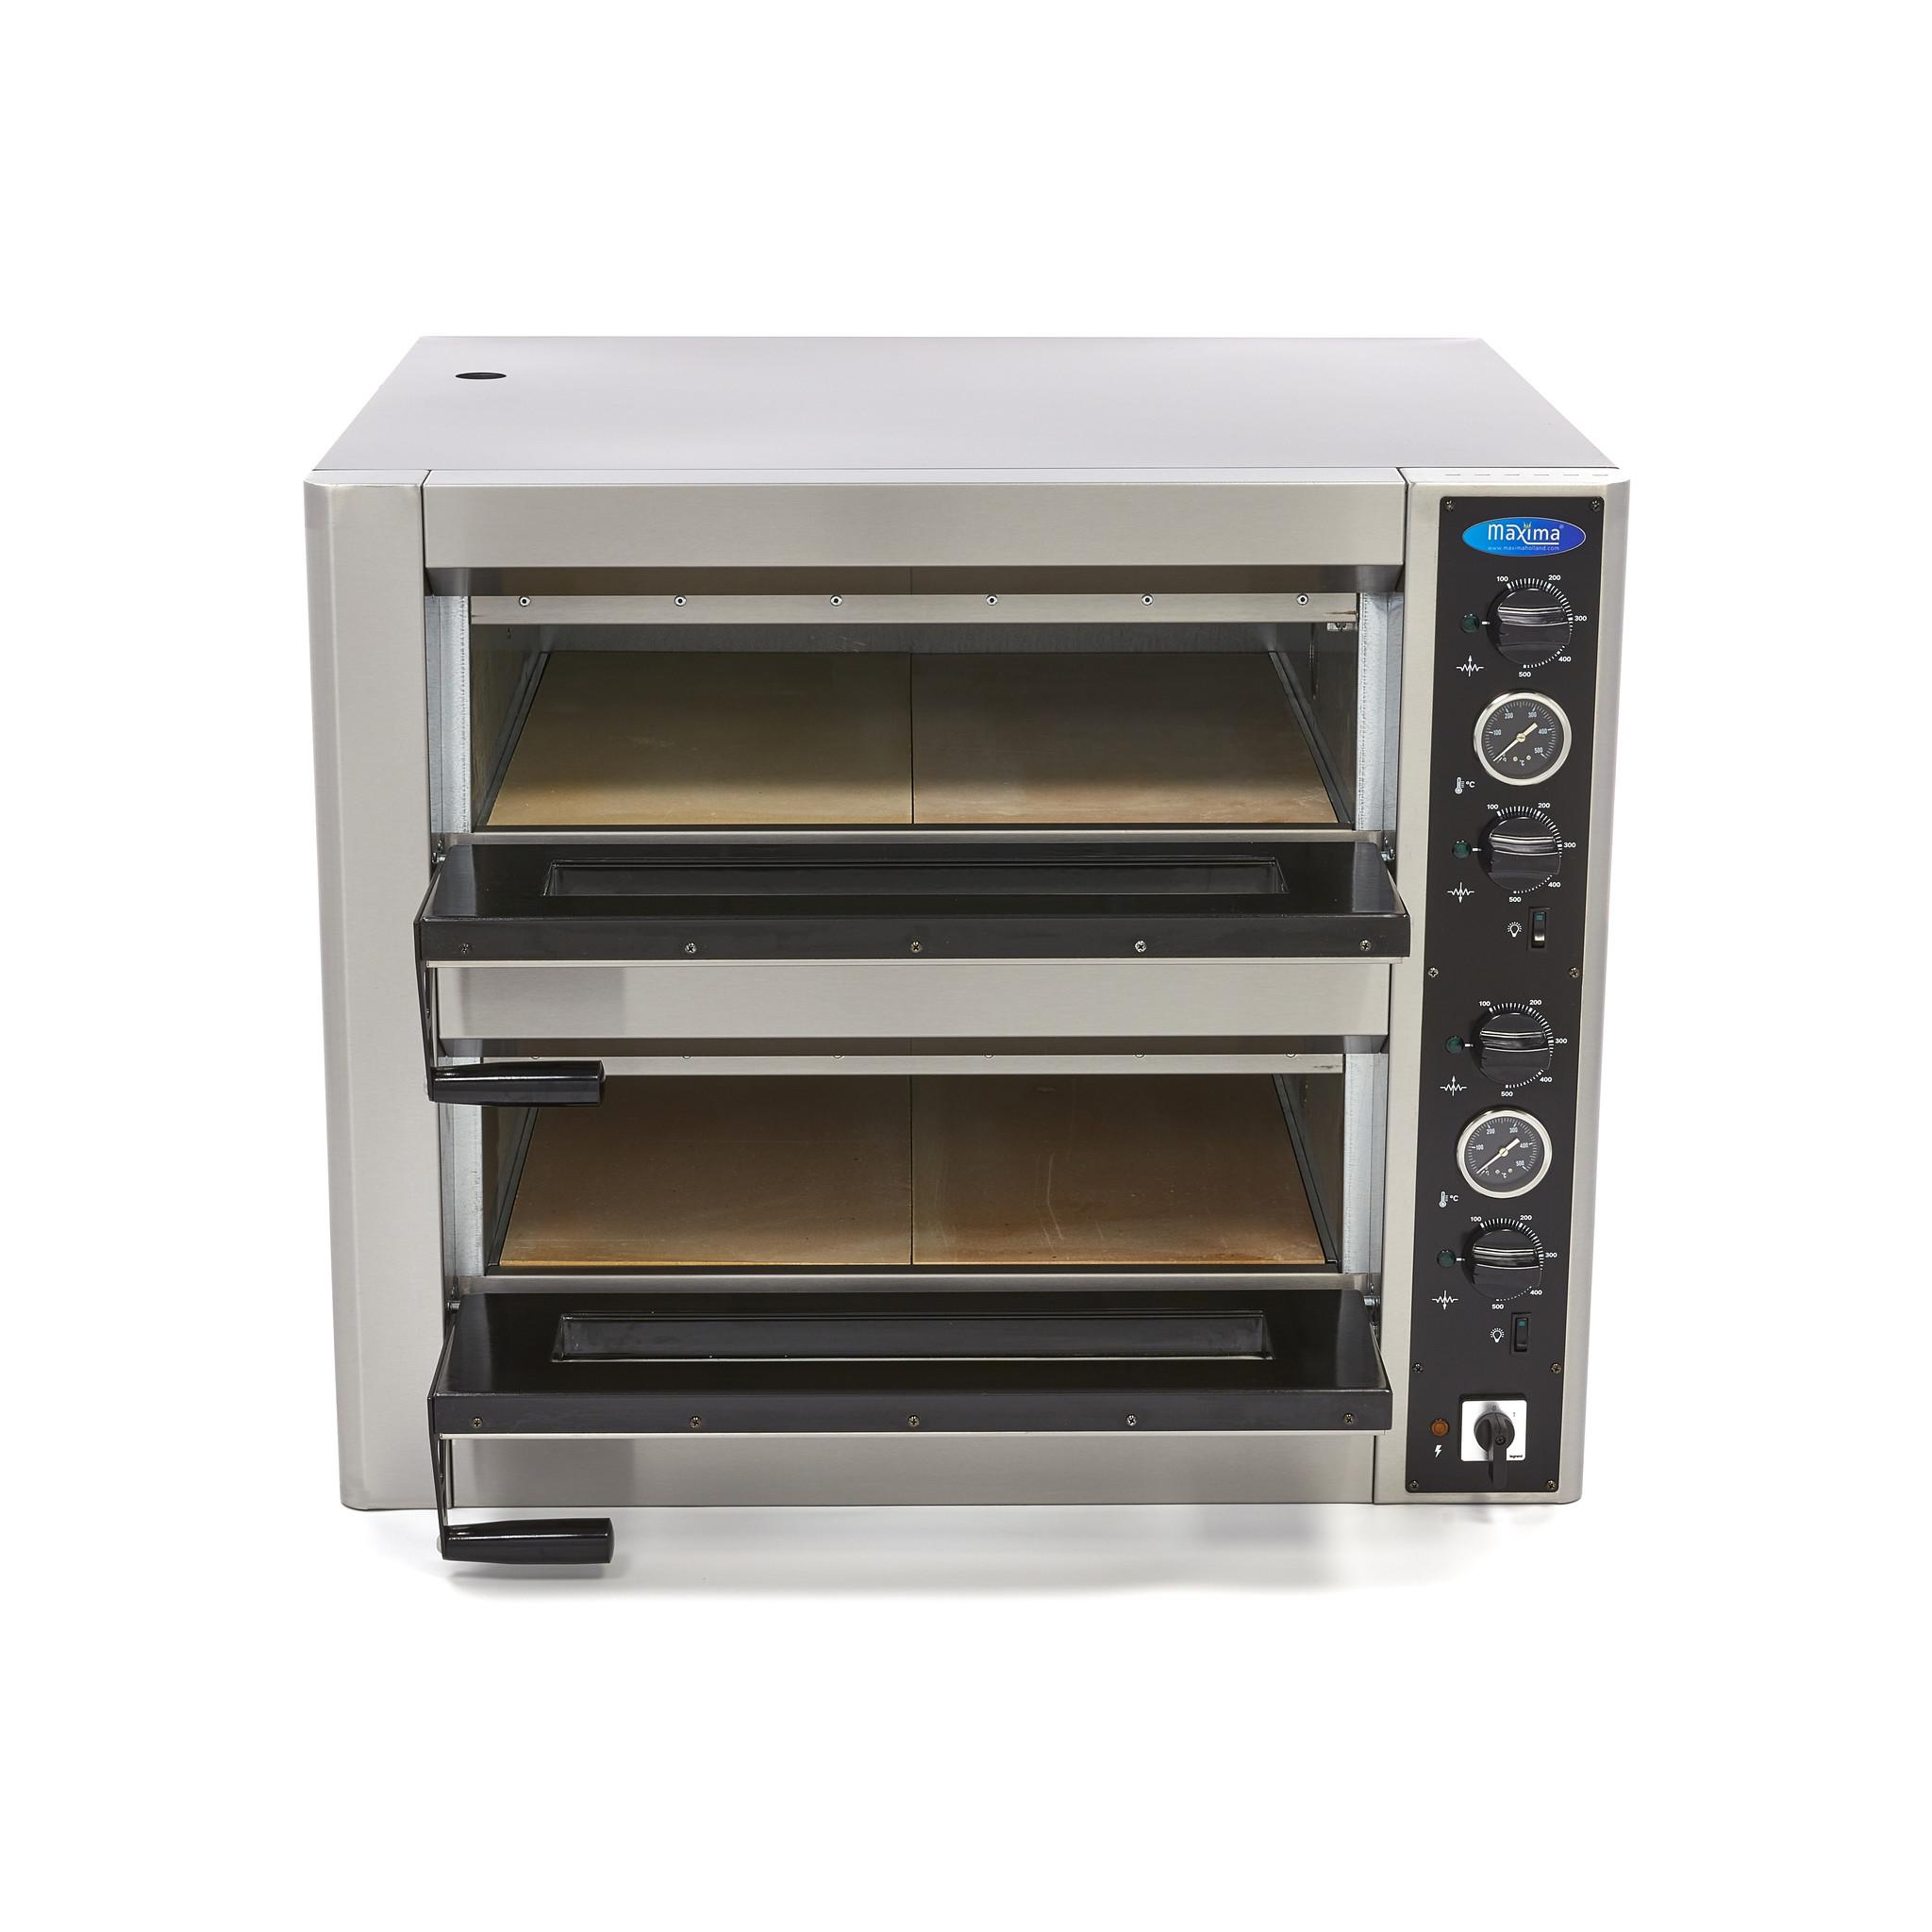 Deluxe Pizza Oven 4 4 X 30 Cm Double 400v Maxima Kitchen Equipment